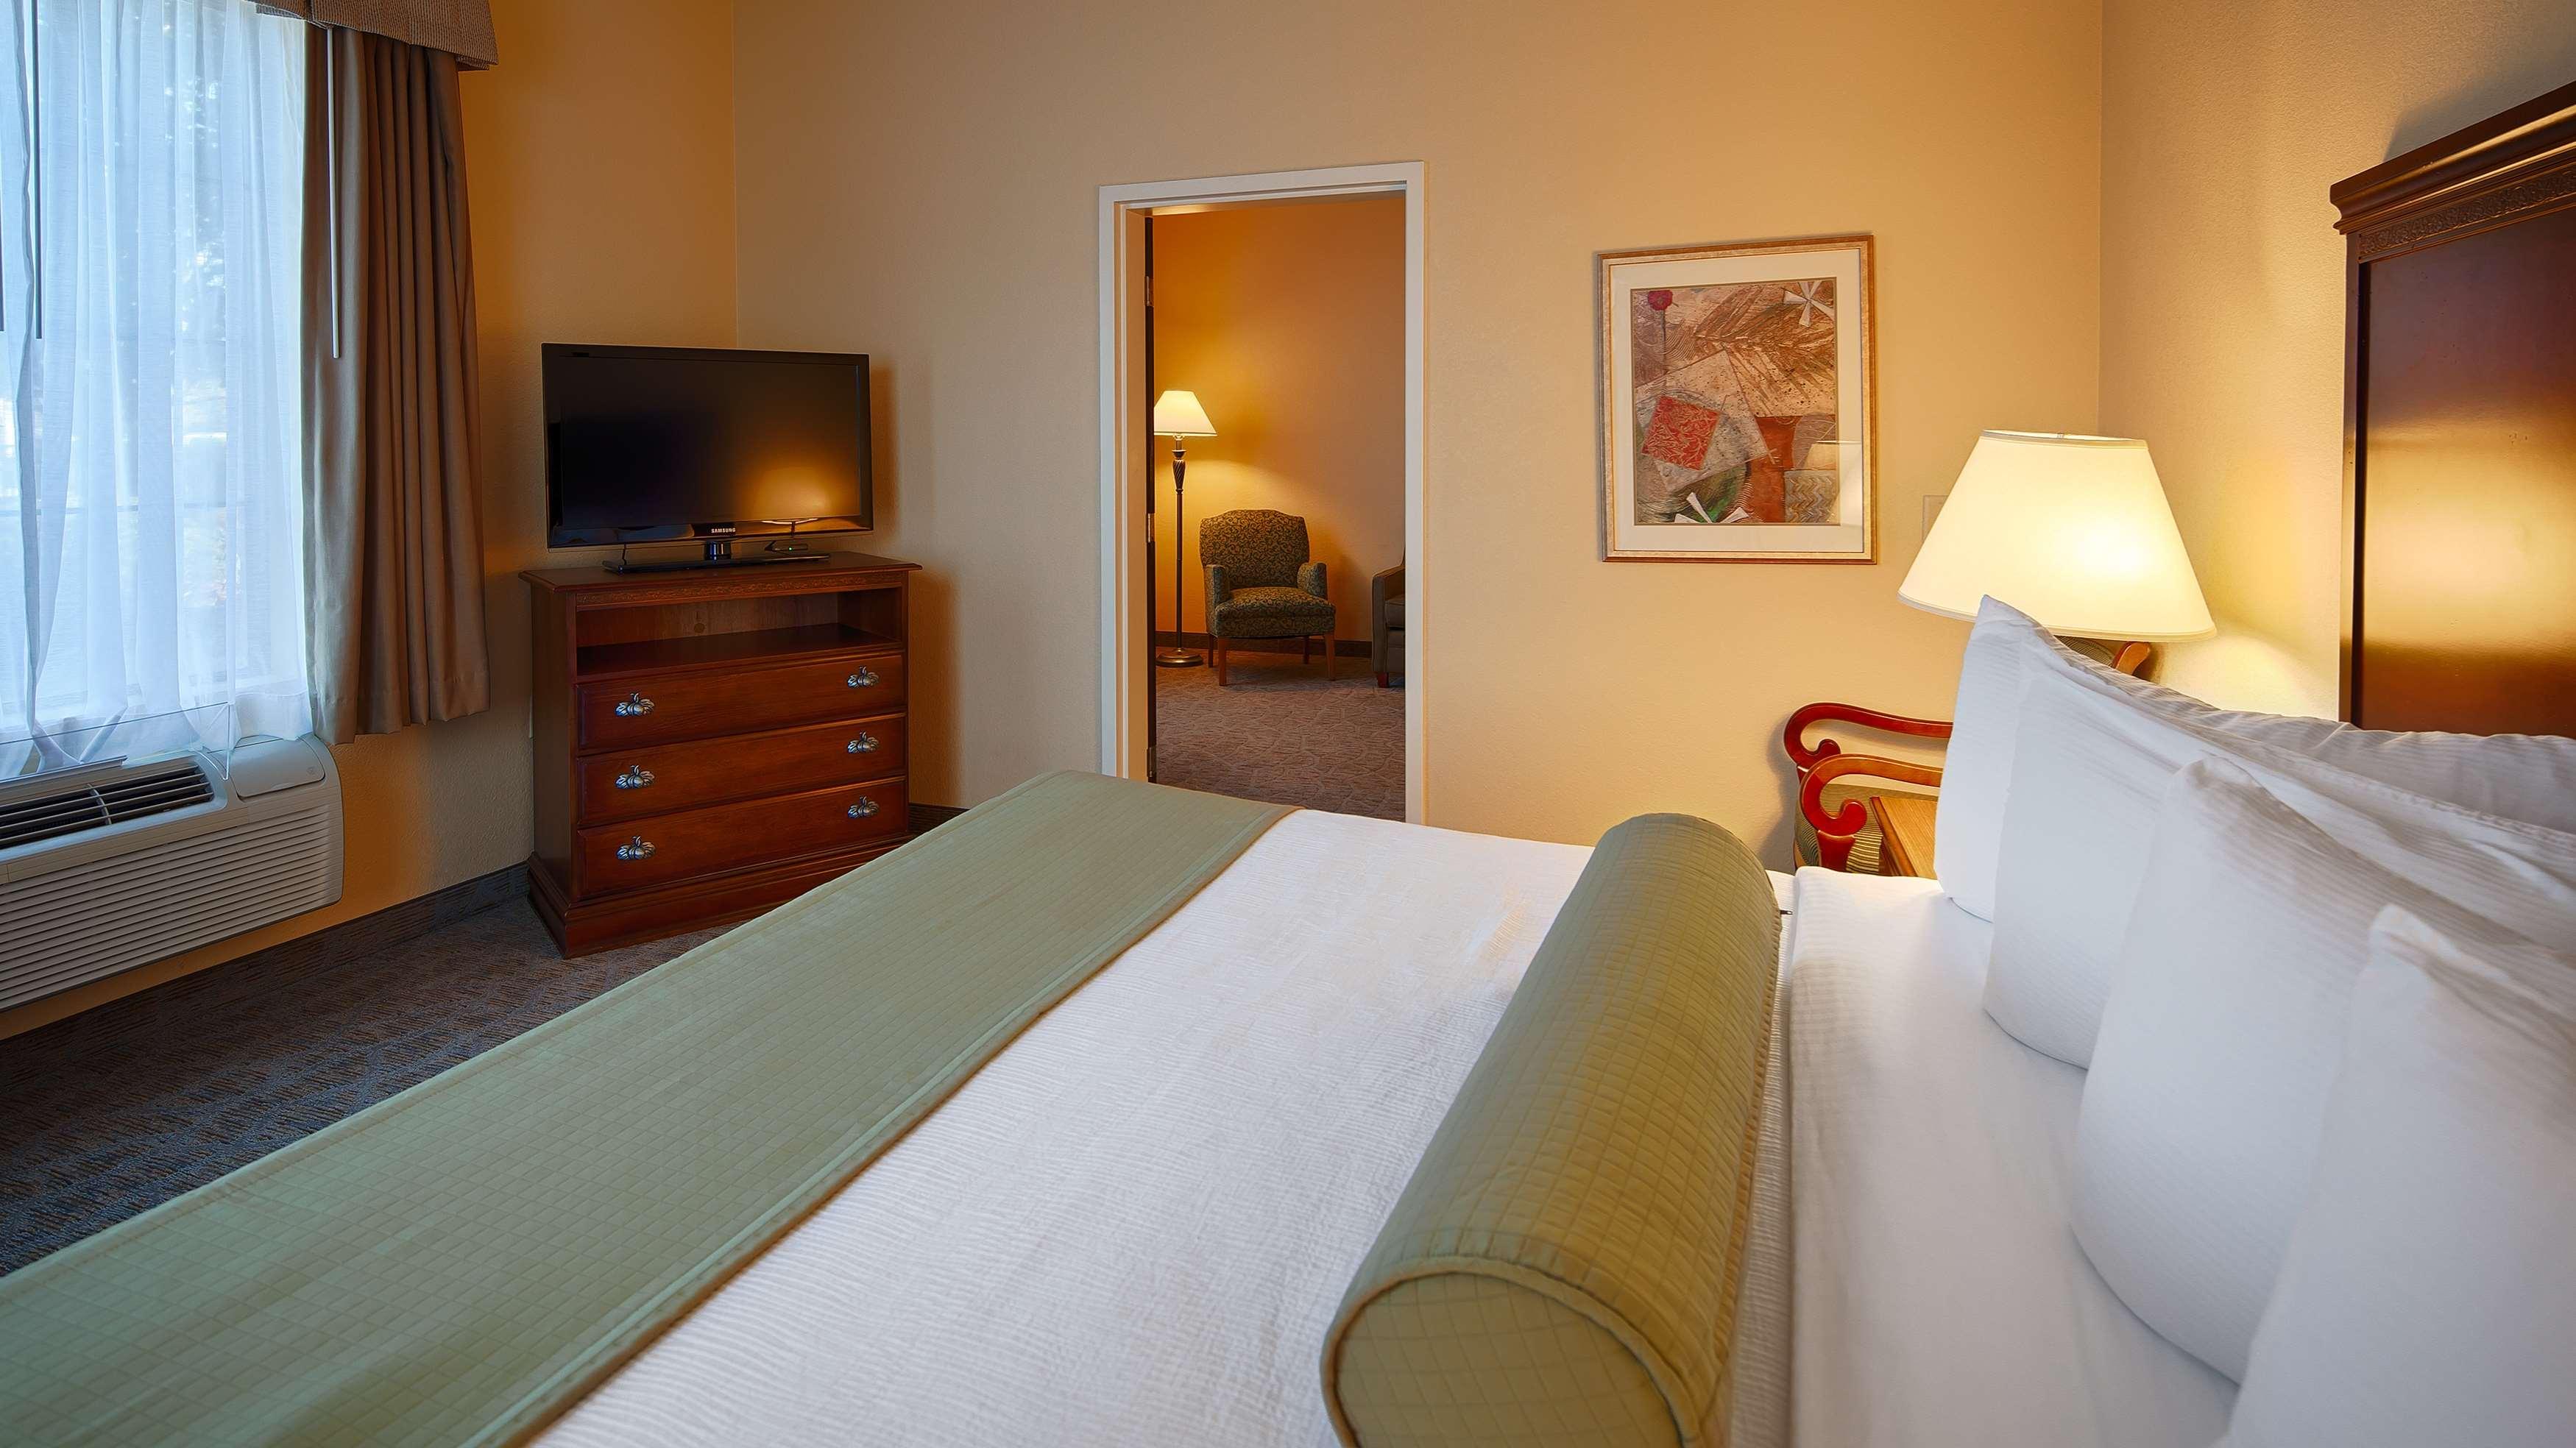 Best Western Plus Executive Hotel & Suites image 25